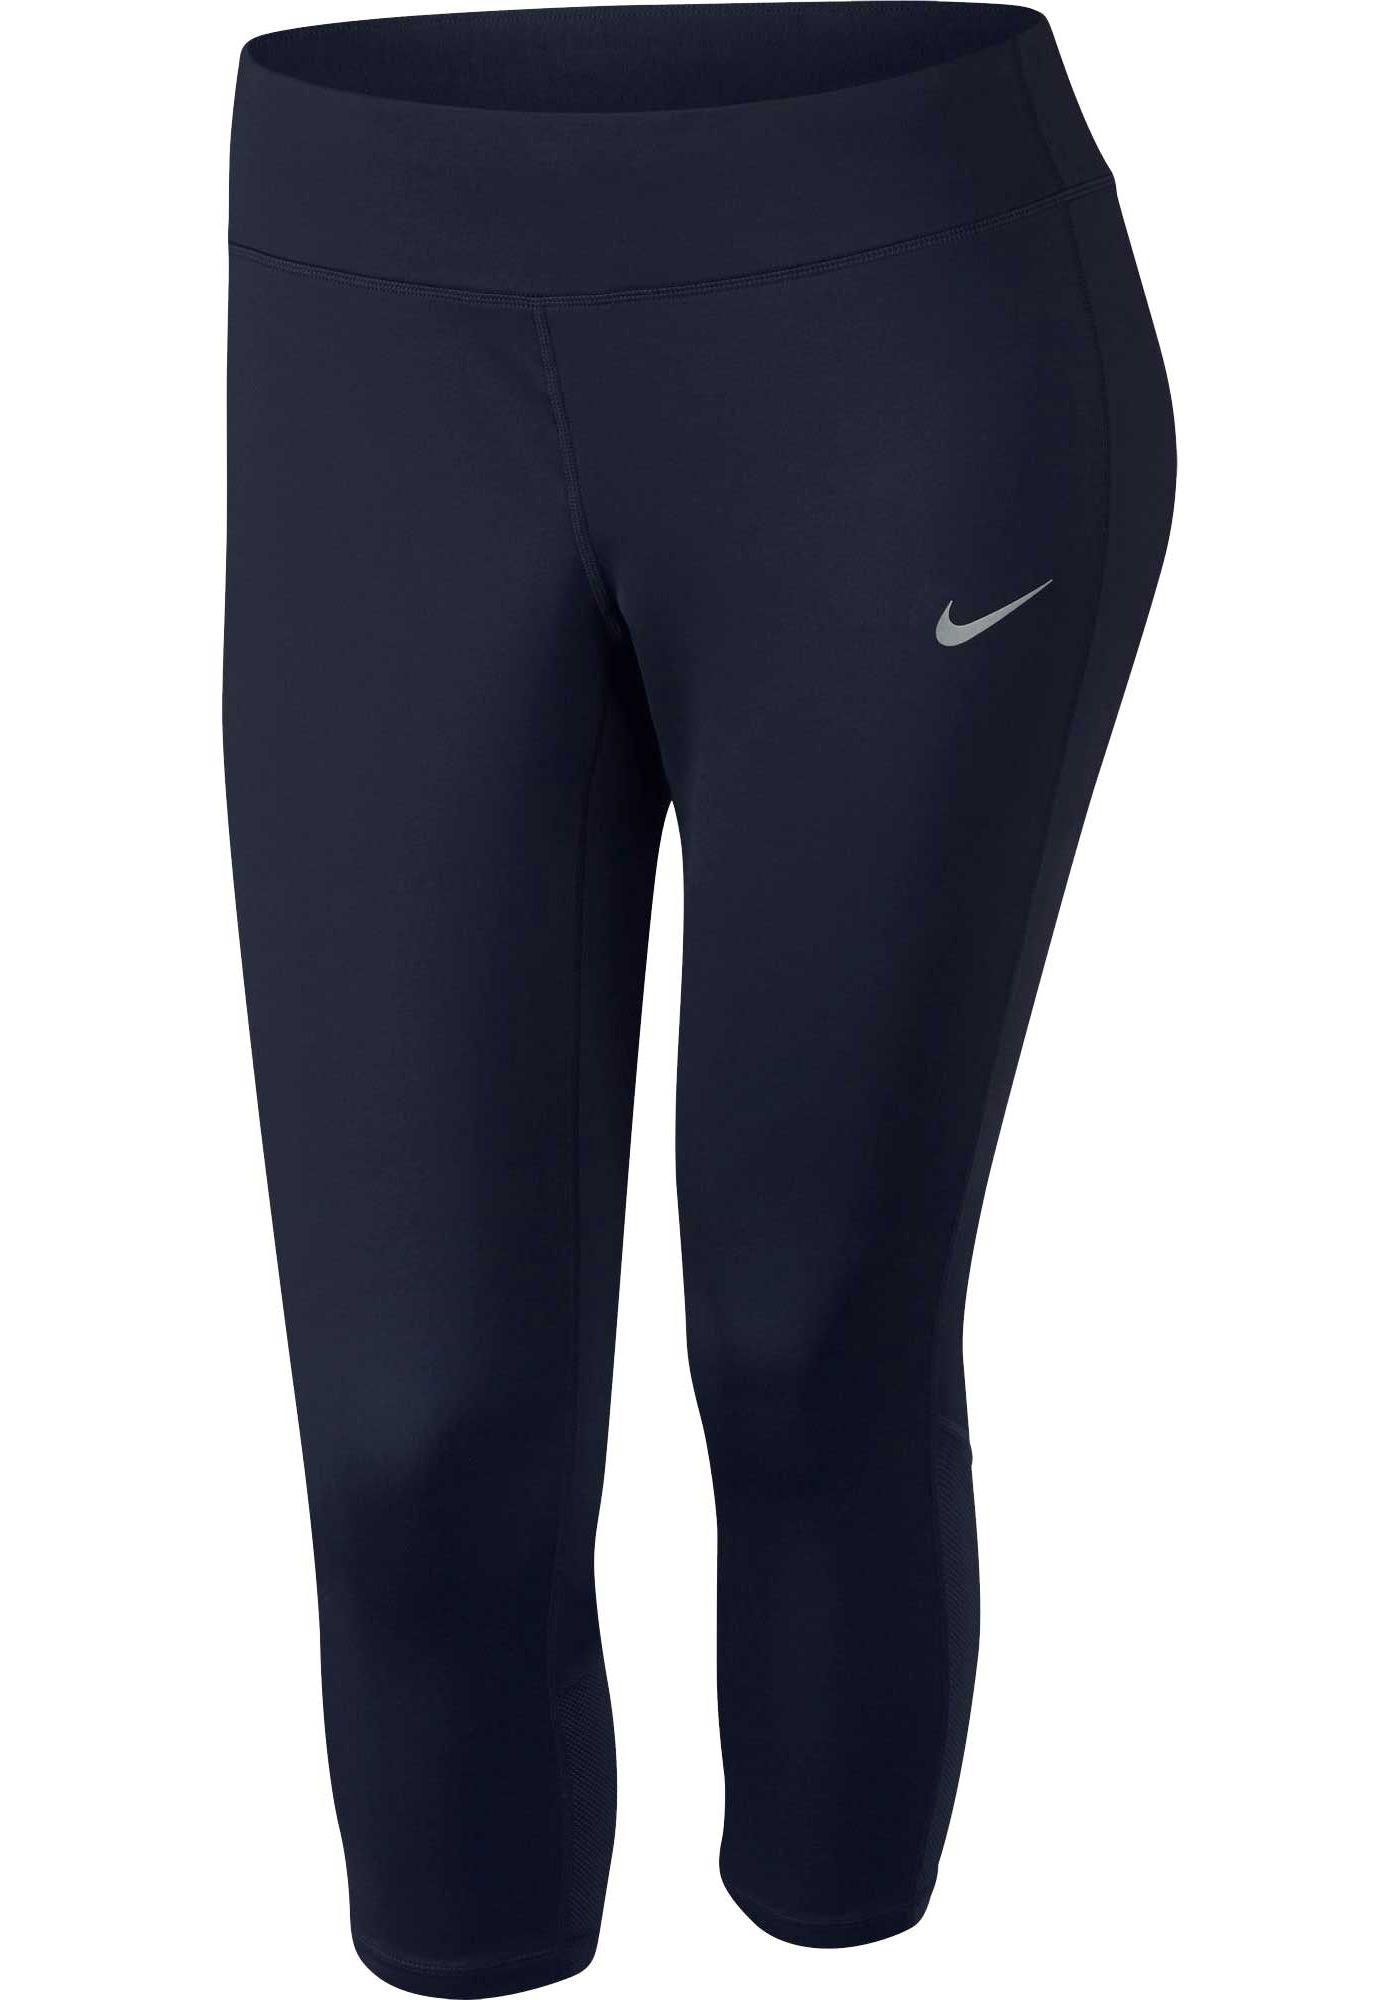 Nike Women's Plus Size Racer Crop Running Tights